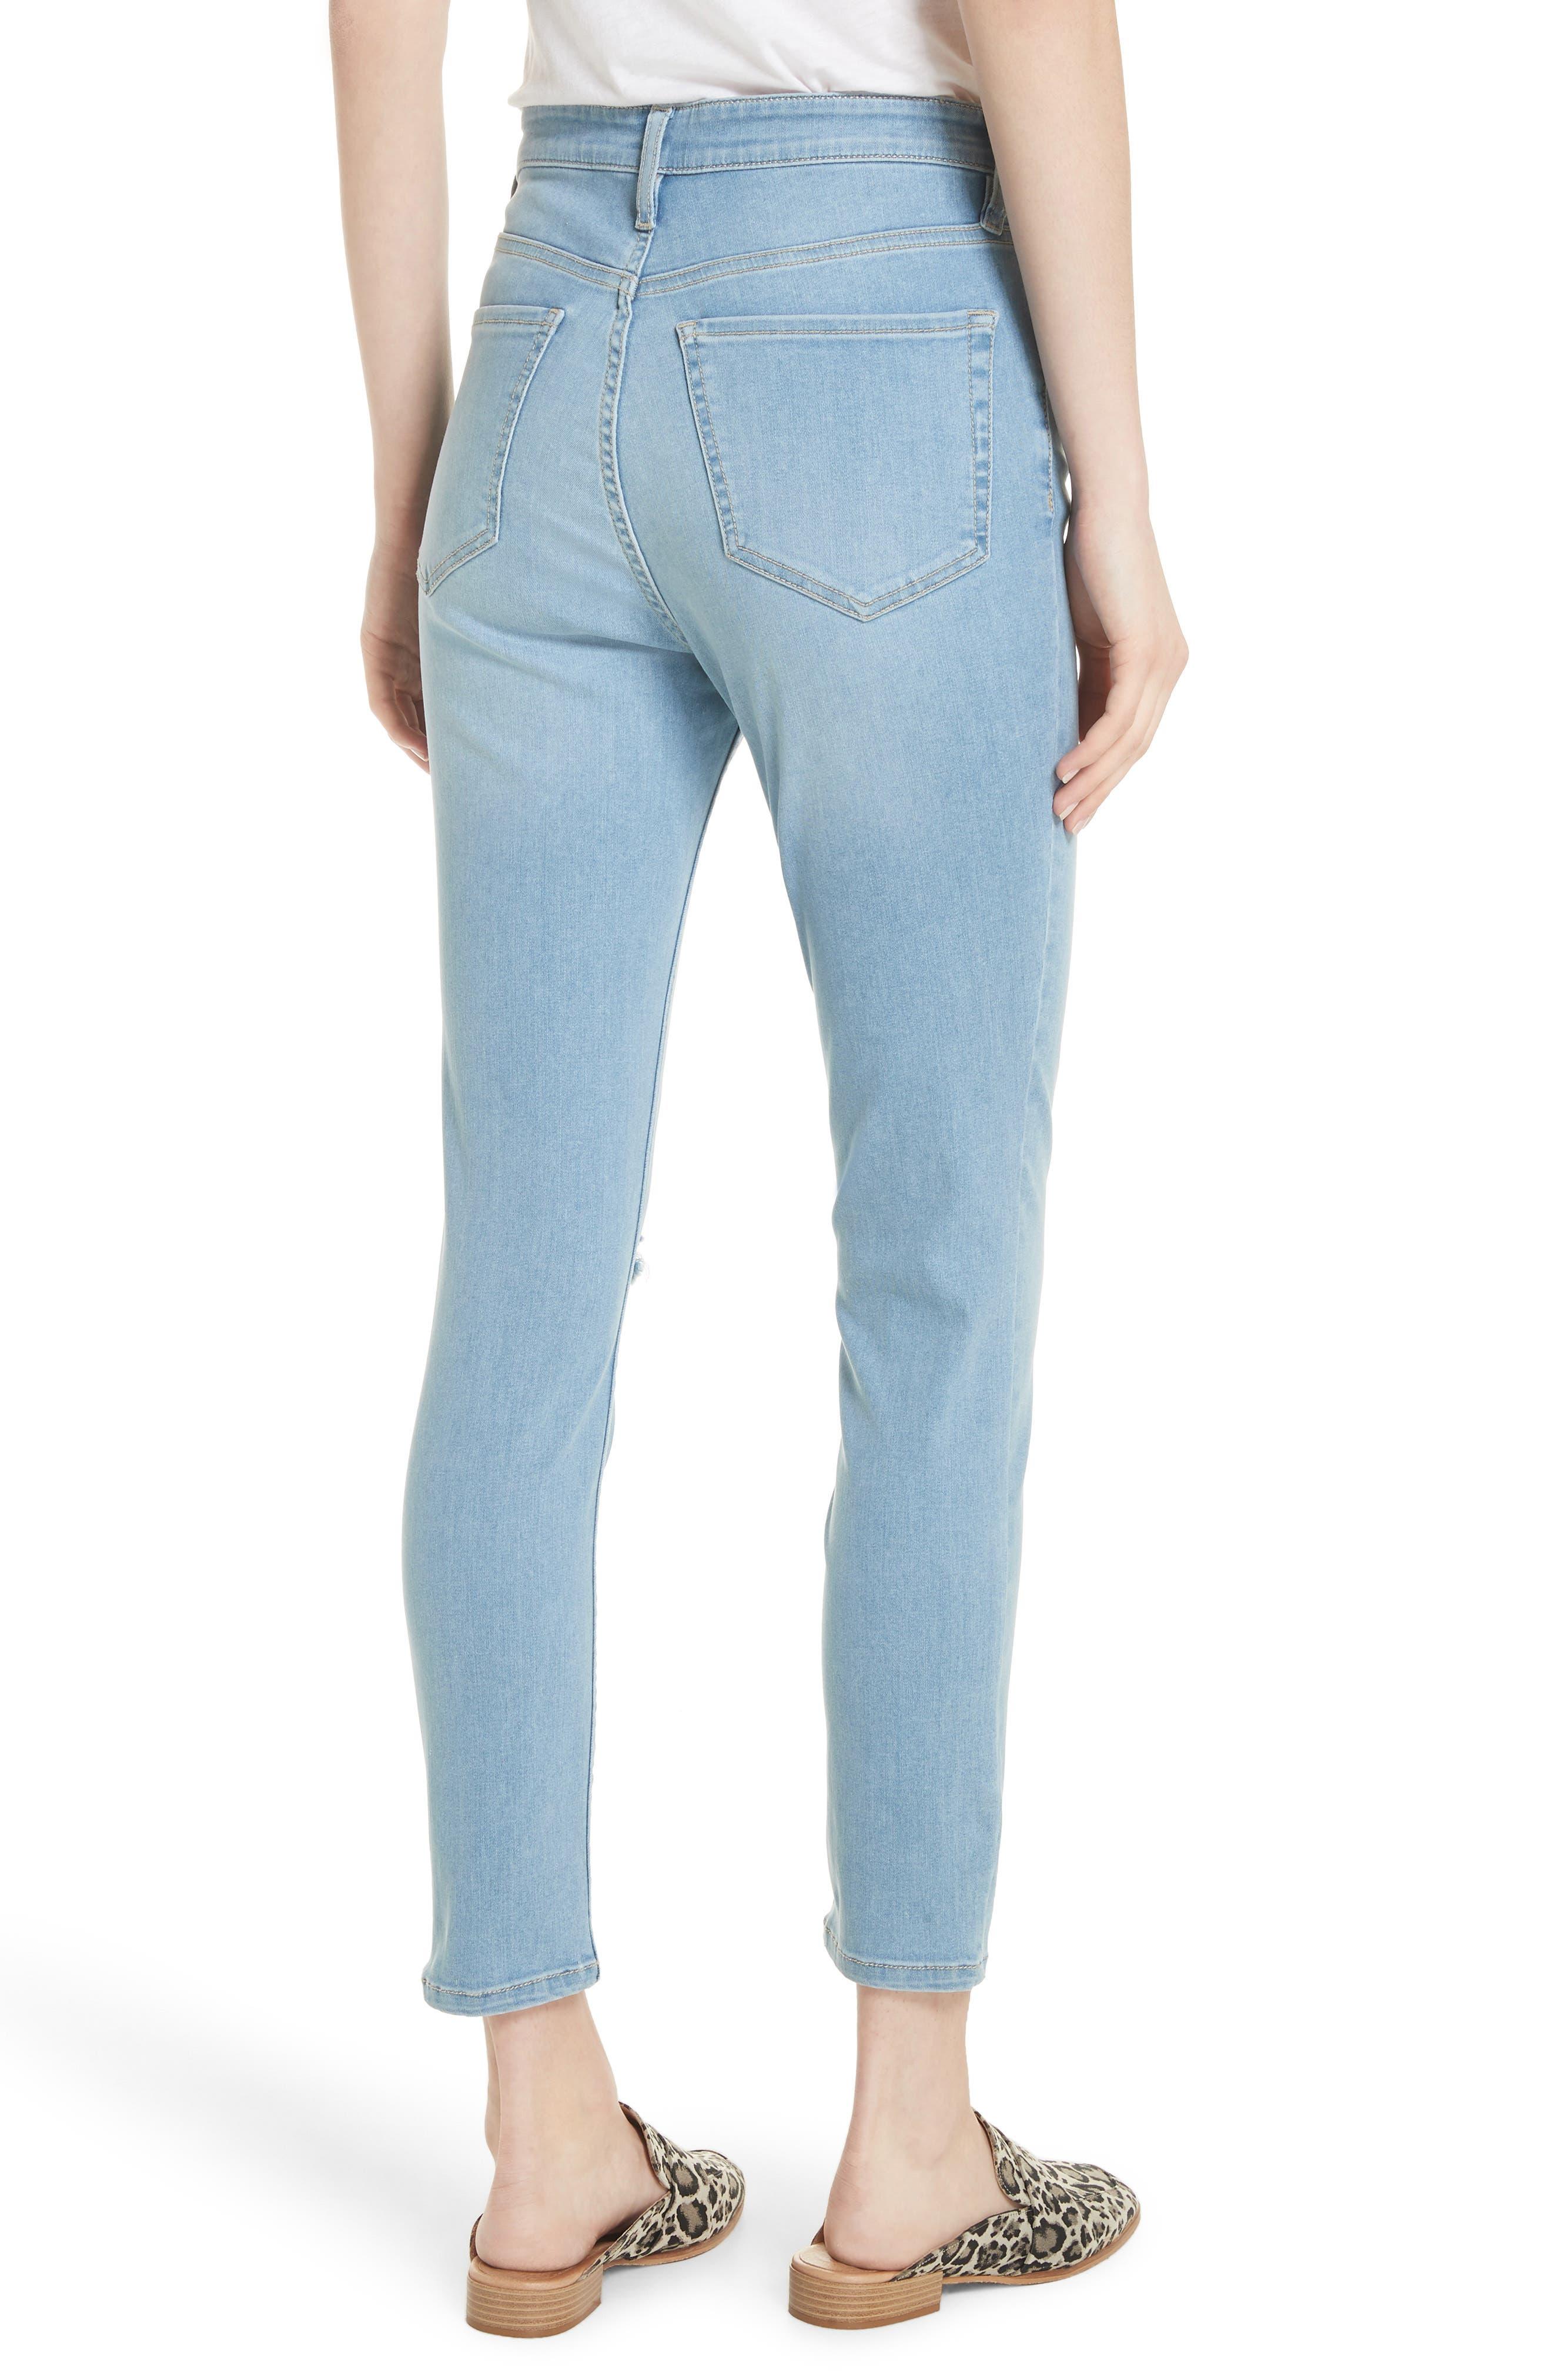 Mara Skinny Jeans,                             Alternate thumbnail 2, color,                             400